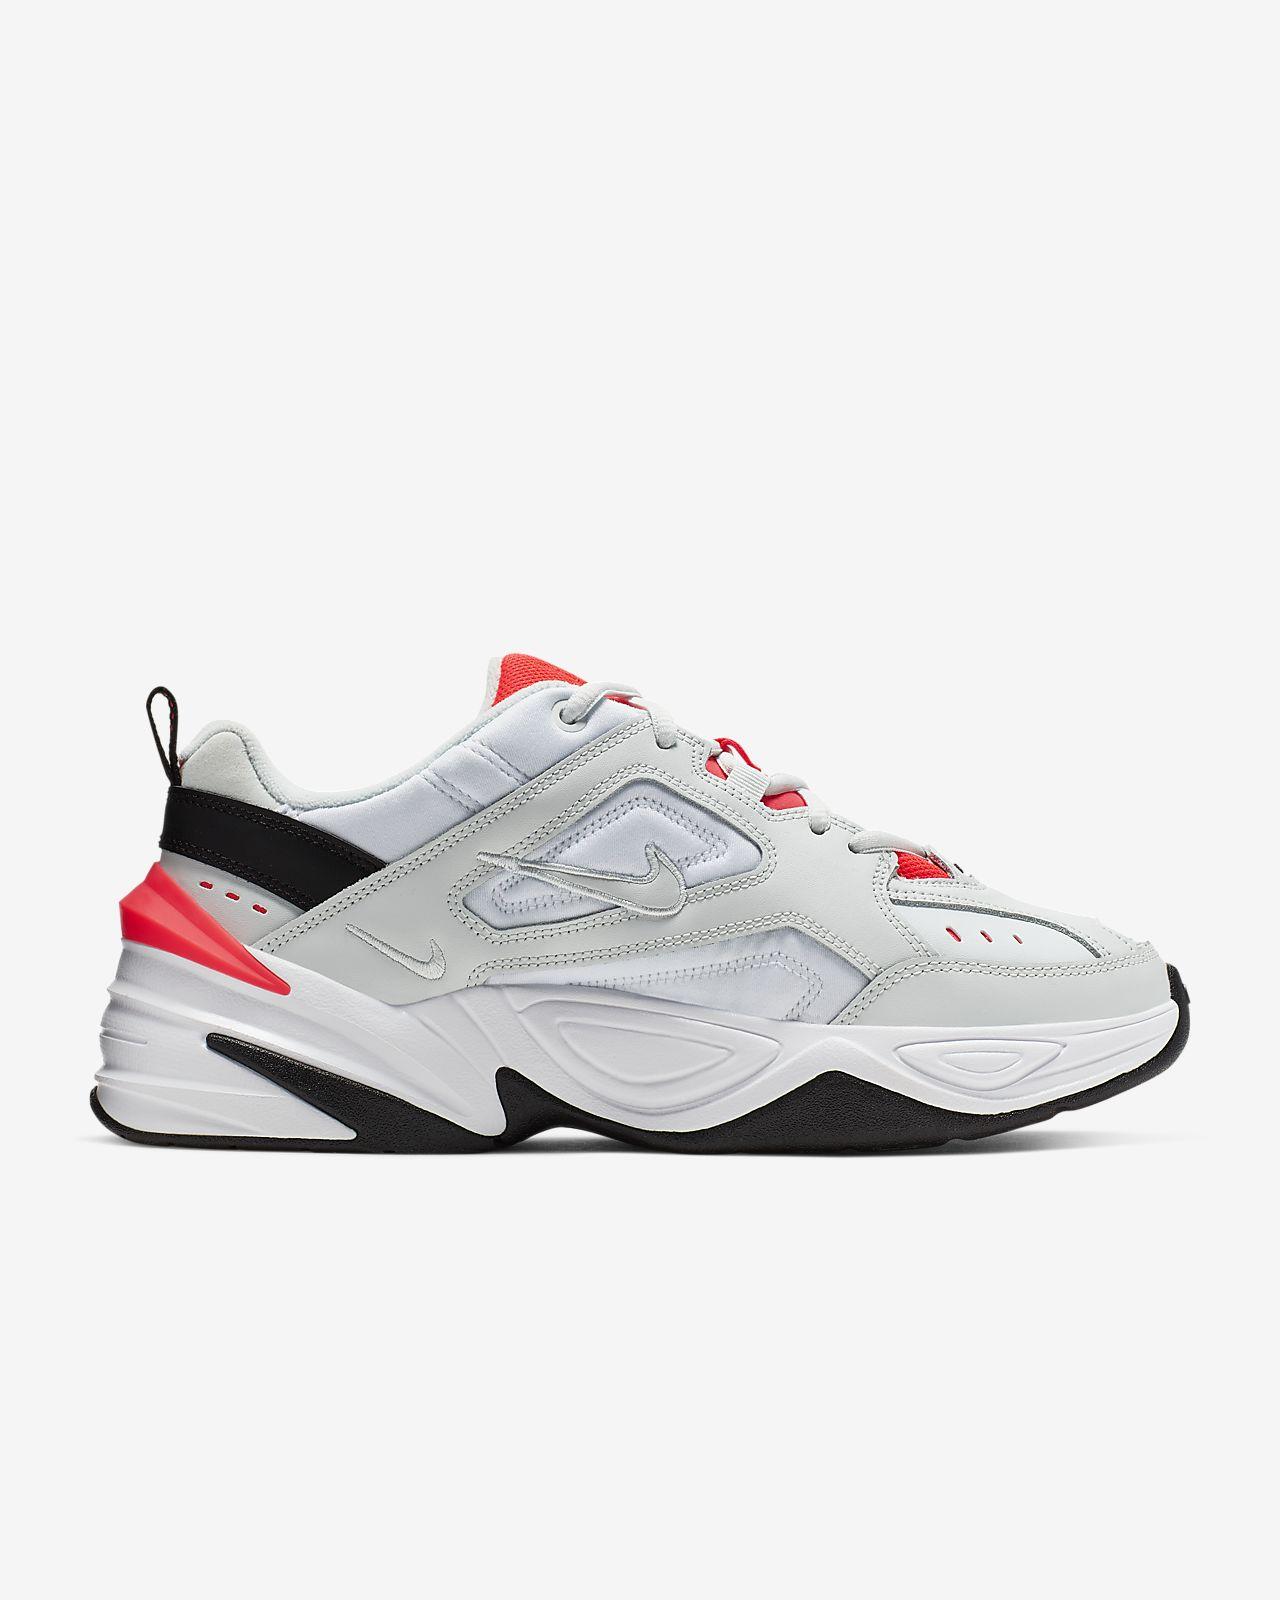 471bcb20a Low Resolution Nike M2K Tekno Shoe Nike M2K Tekno Shoe